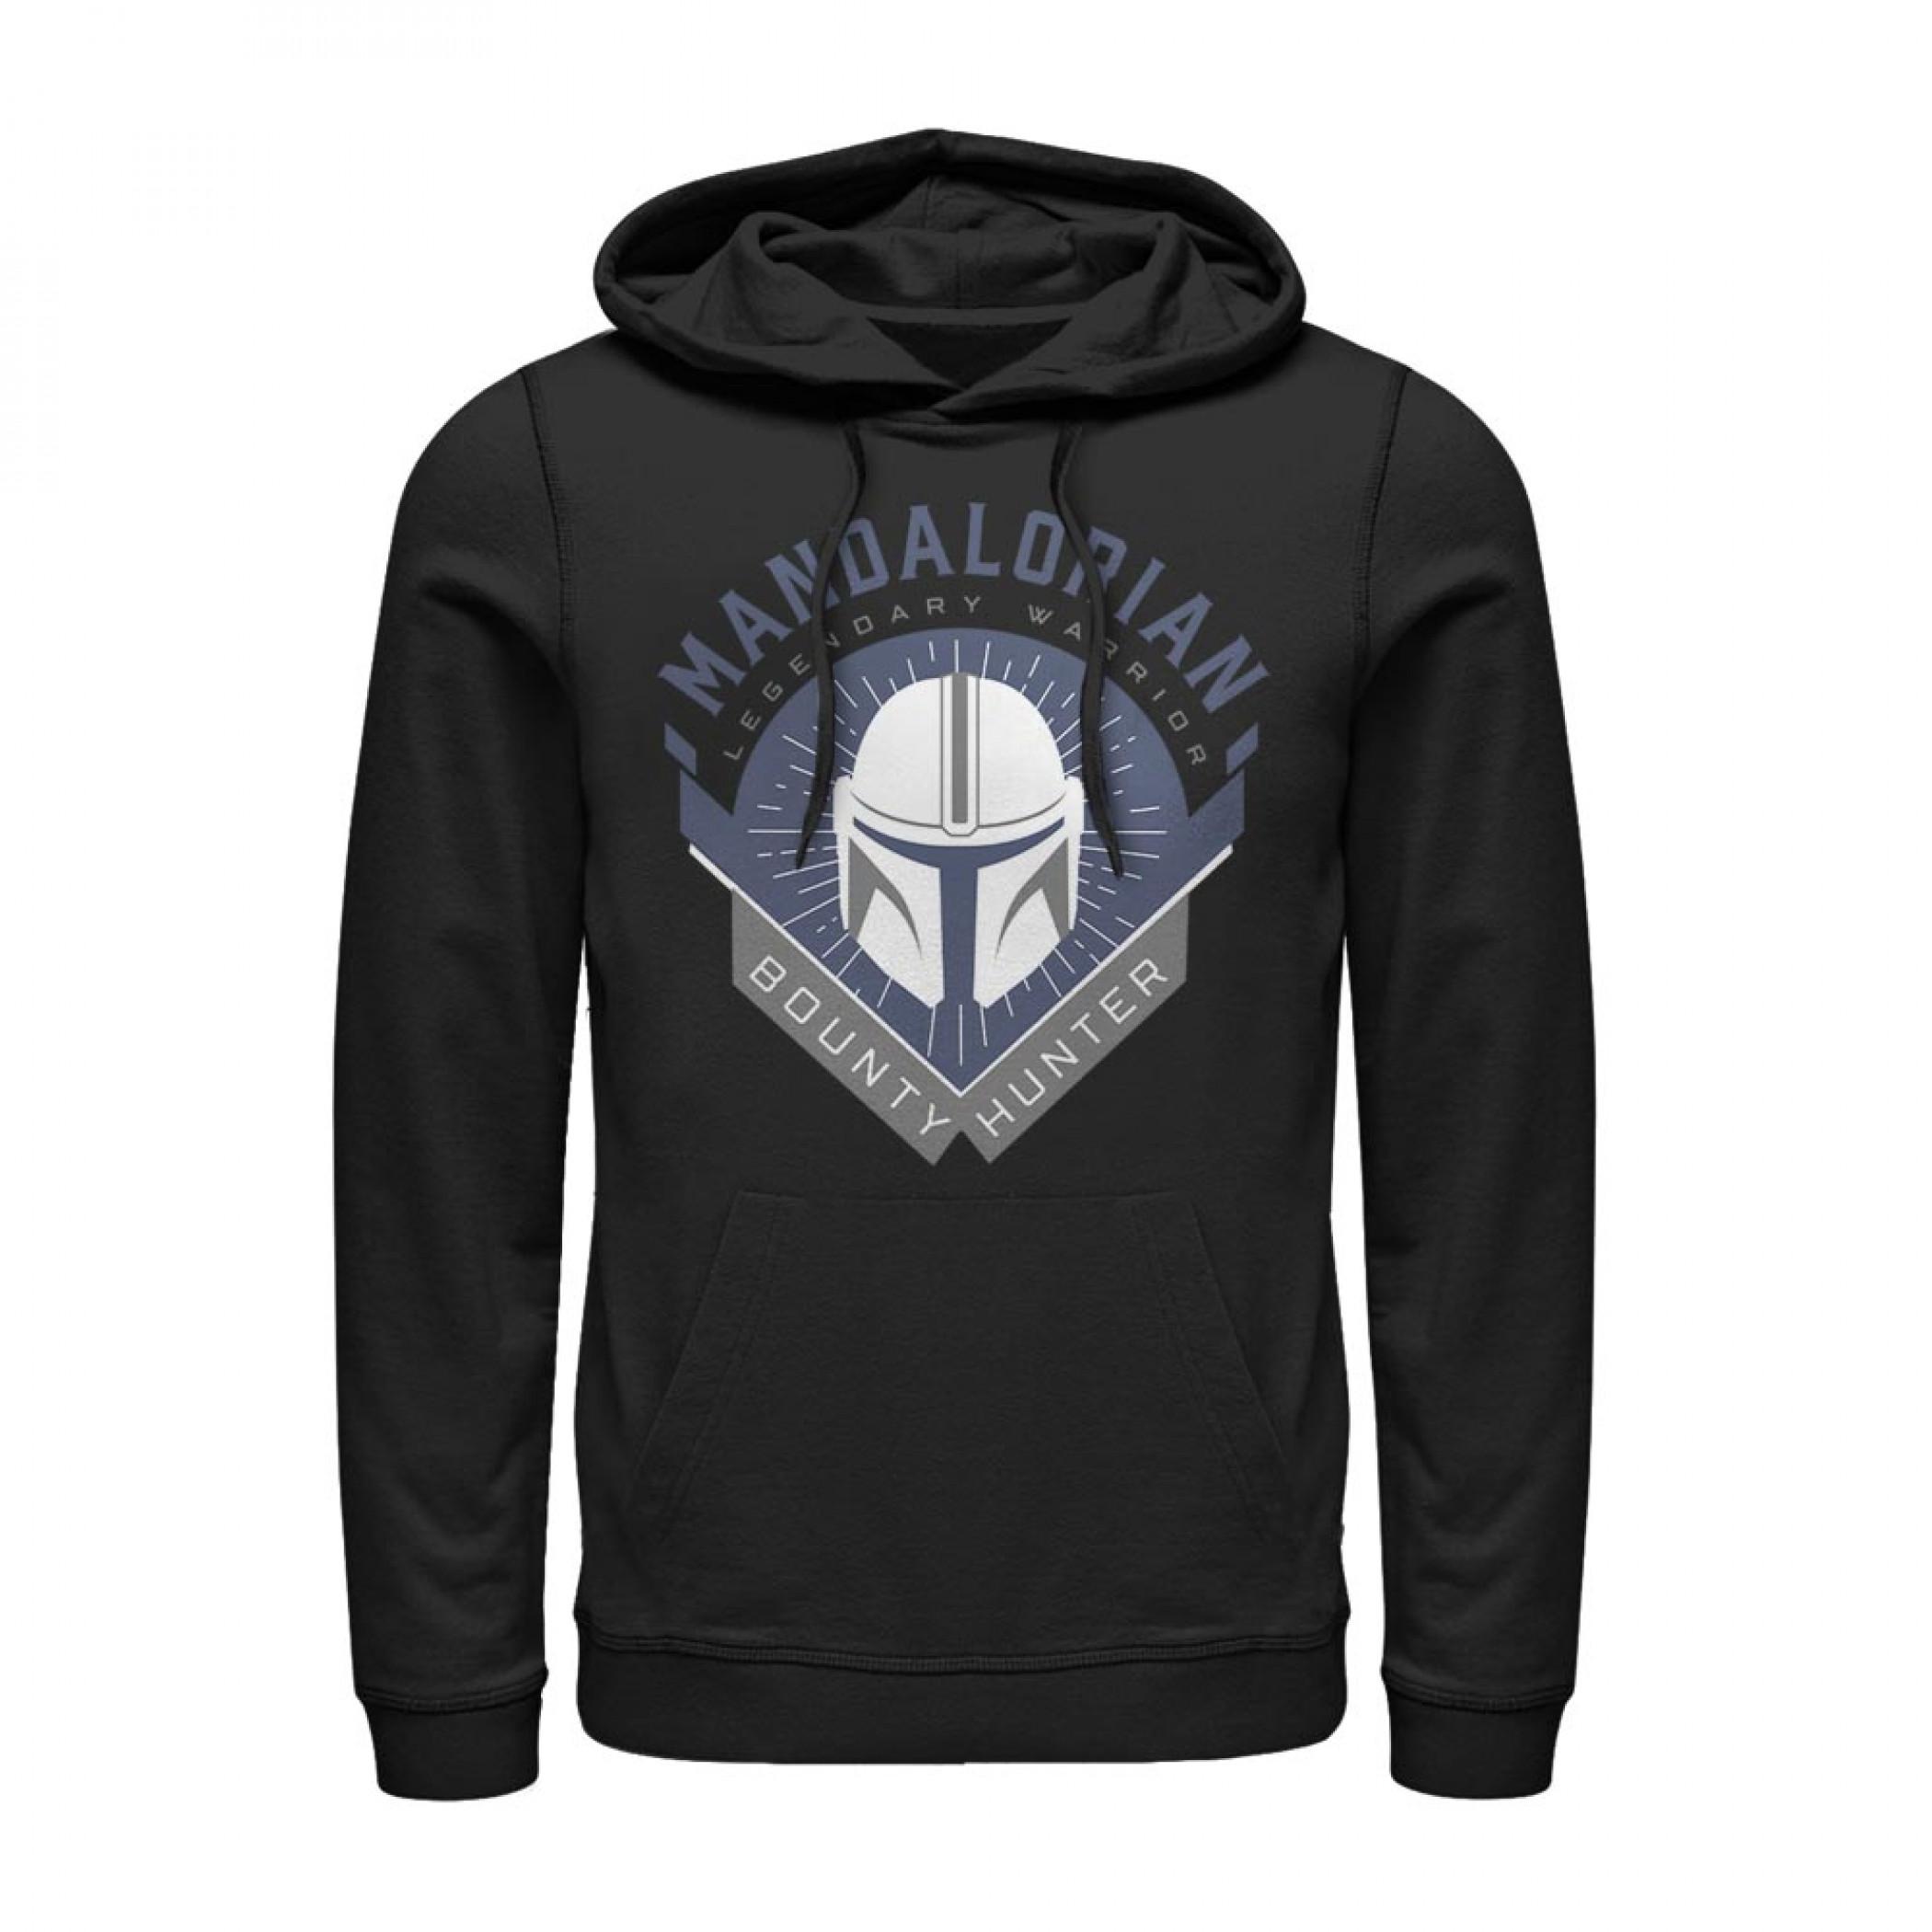 The Mandalorian Warrior Emblem Hoodie